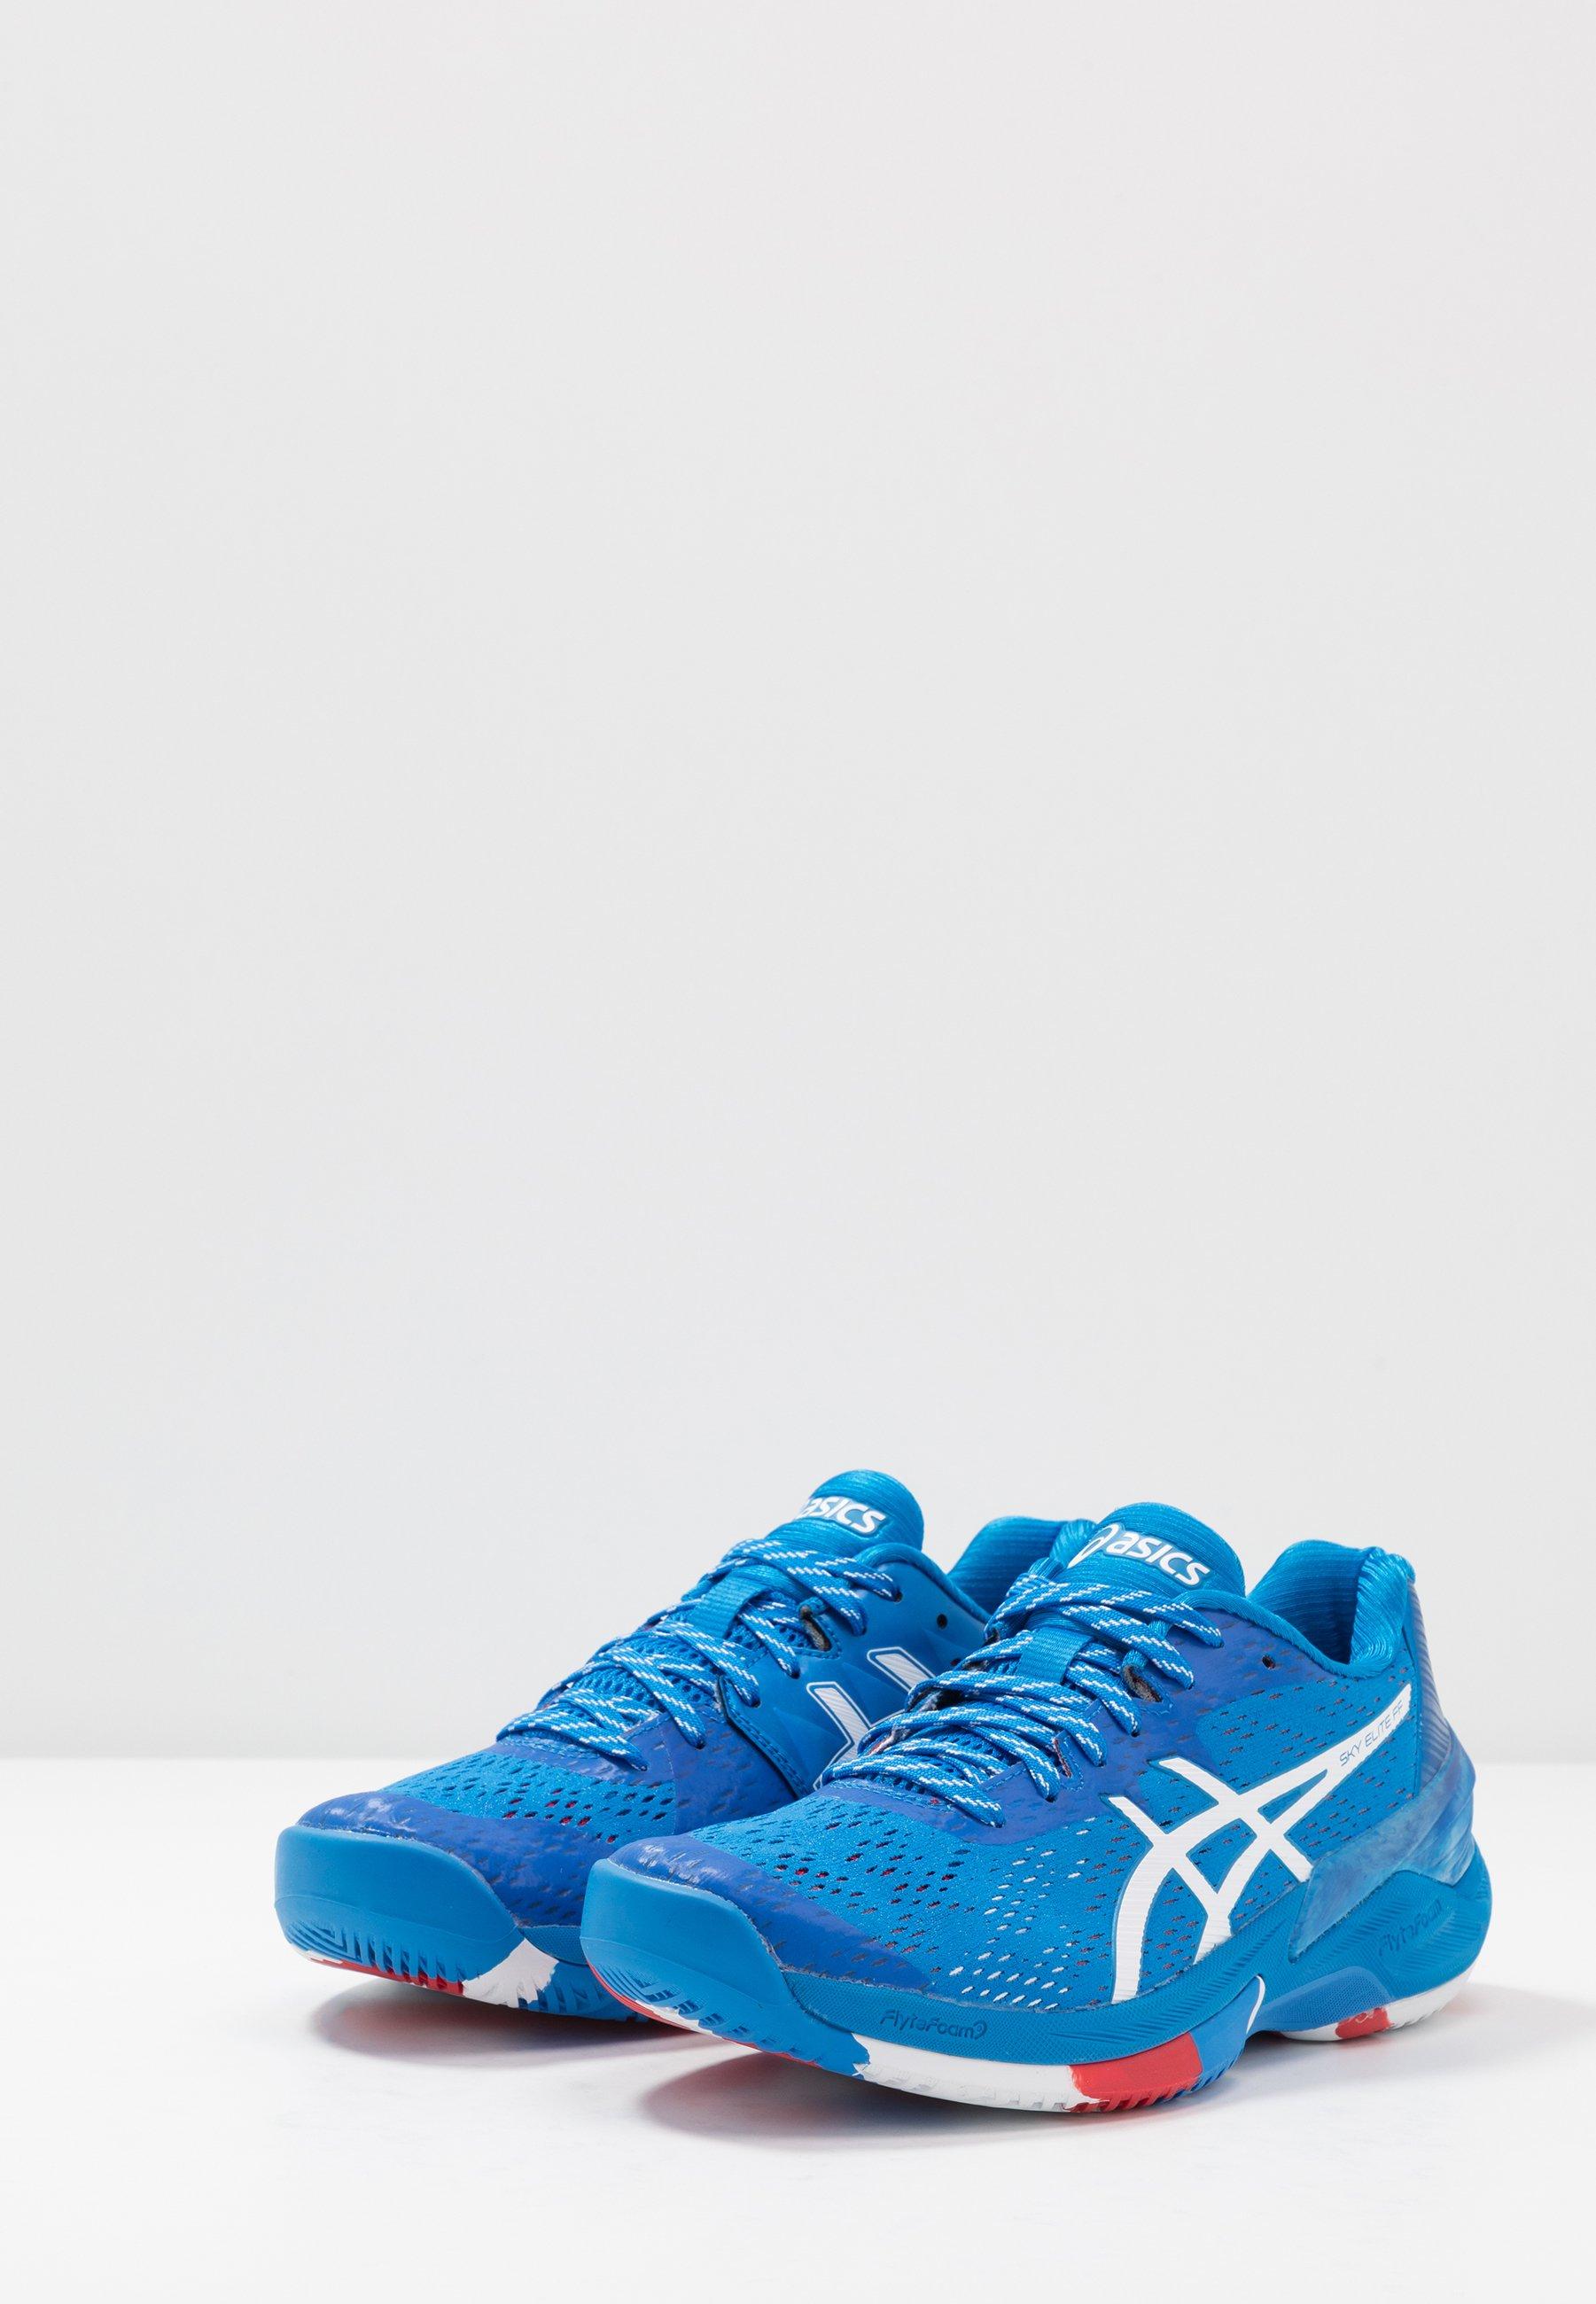 Asics Sky Elite Ff - Chaussures De Handball Electric Blue/white